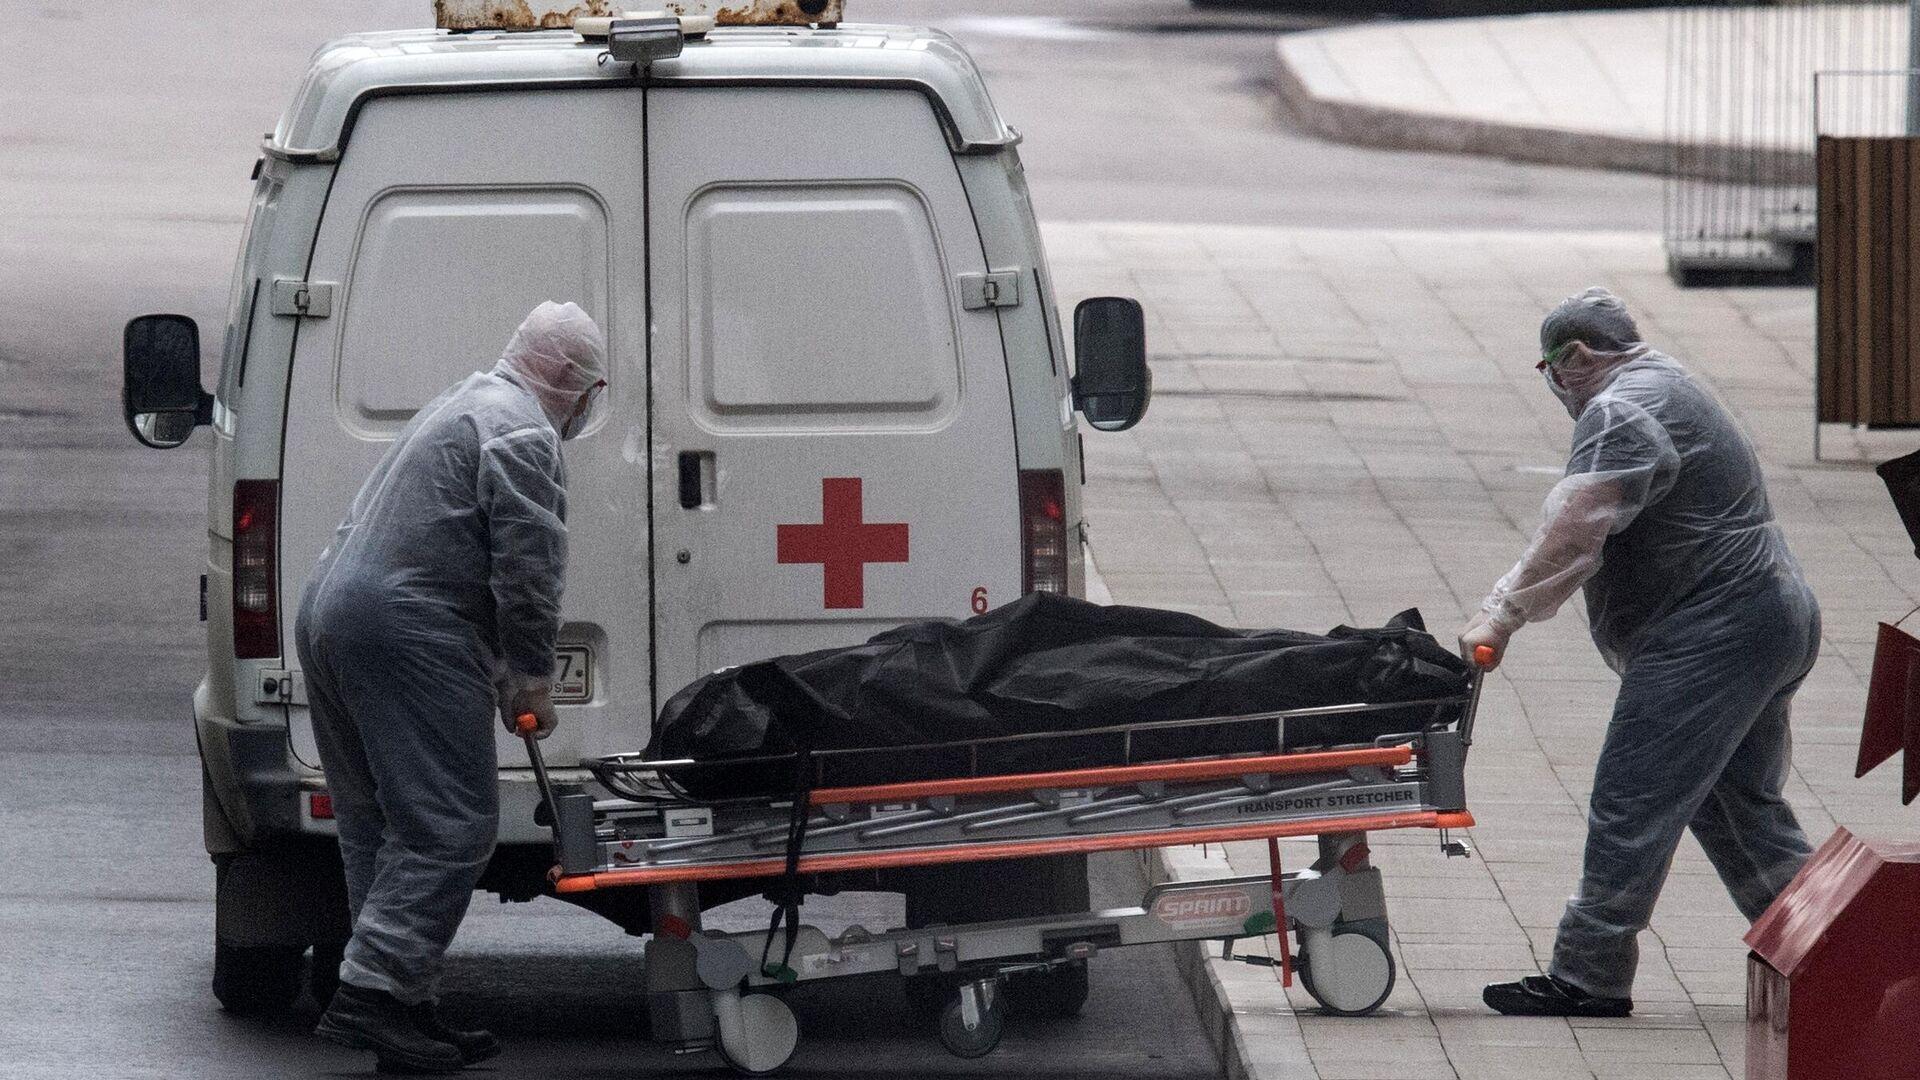 Медицинские работники перевозят тело умершего на территории карантинного центра в Коммунарке - РИА Новости, 1920, 28.09.2021